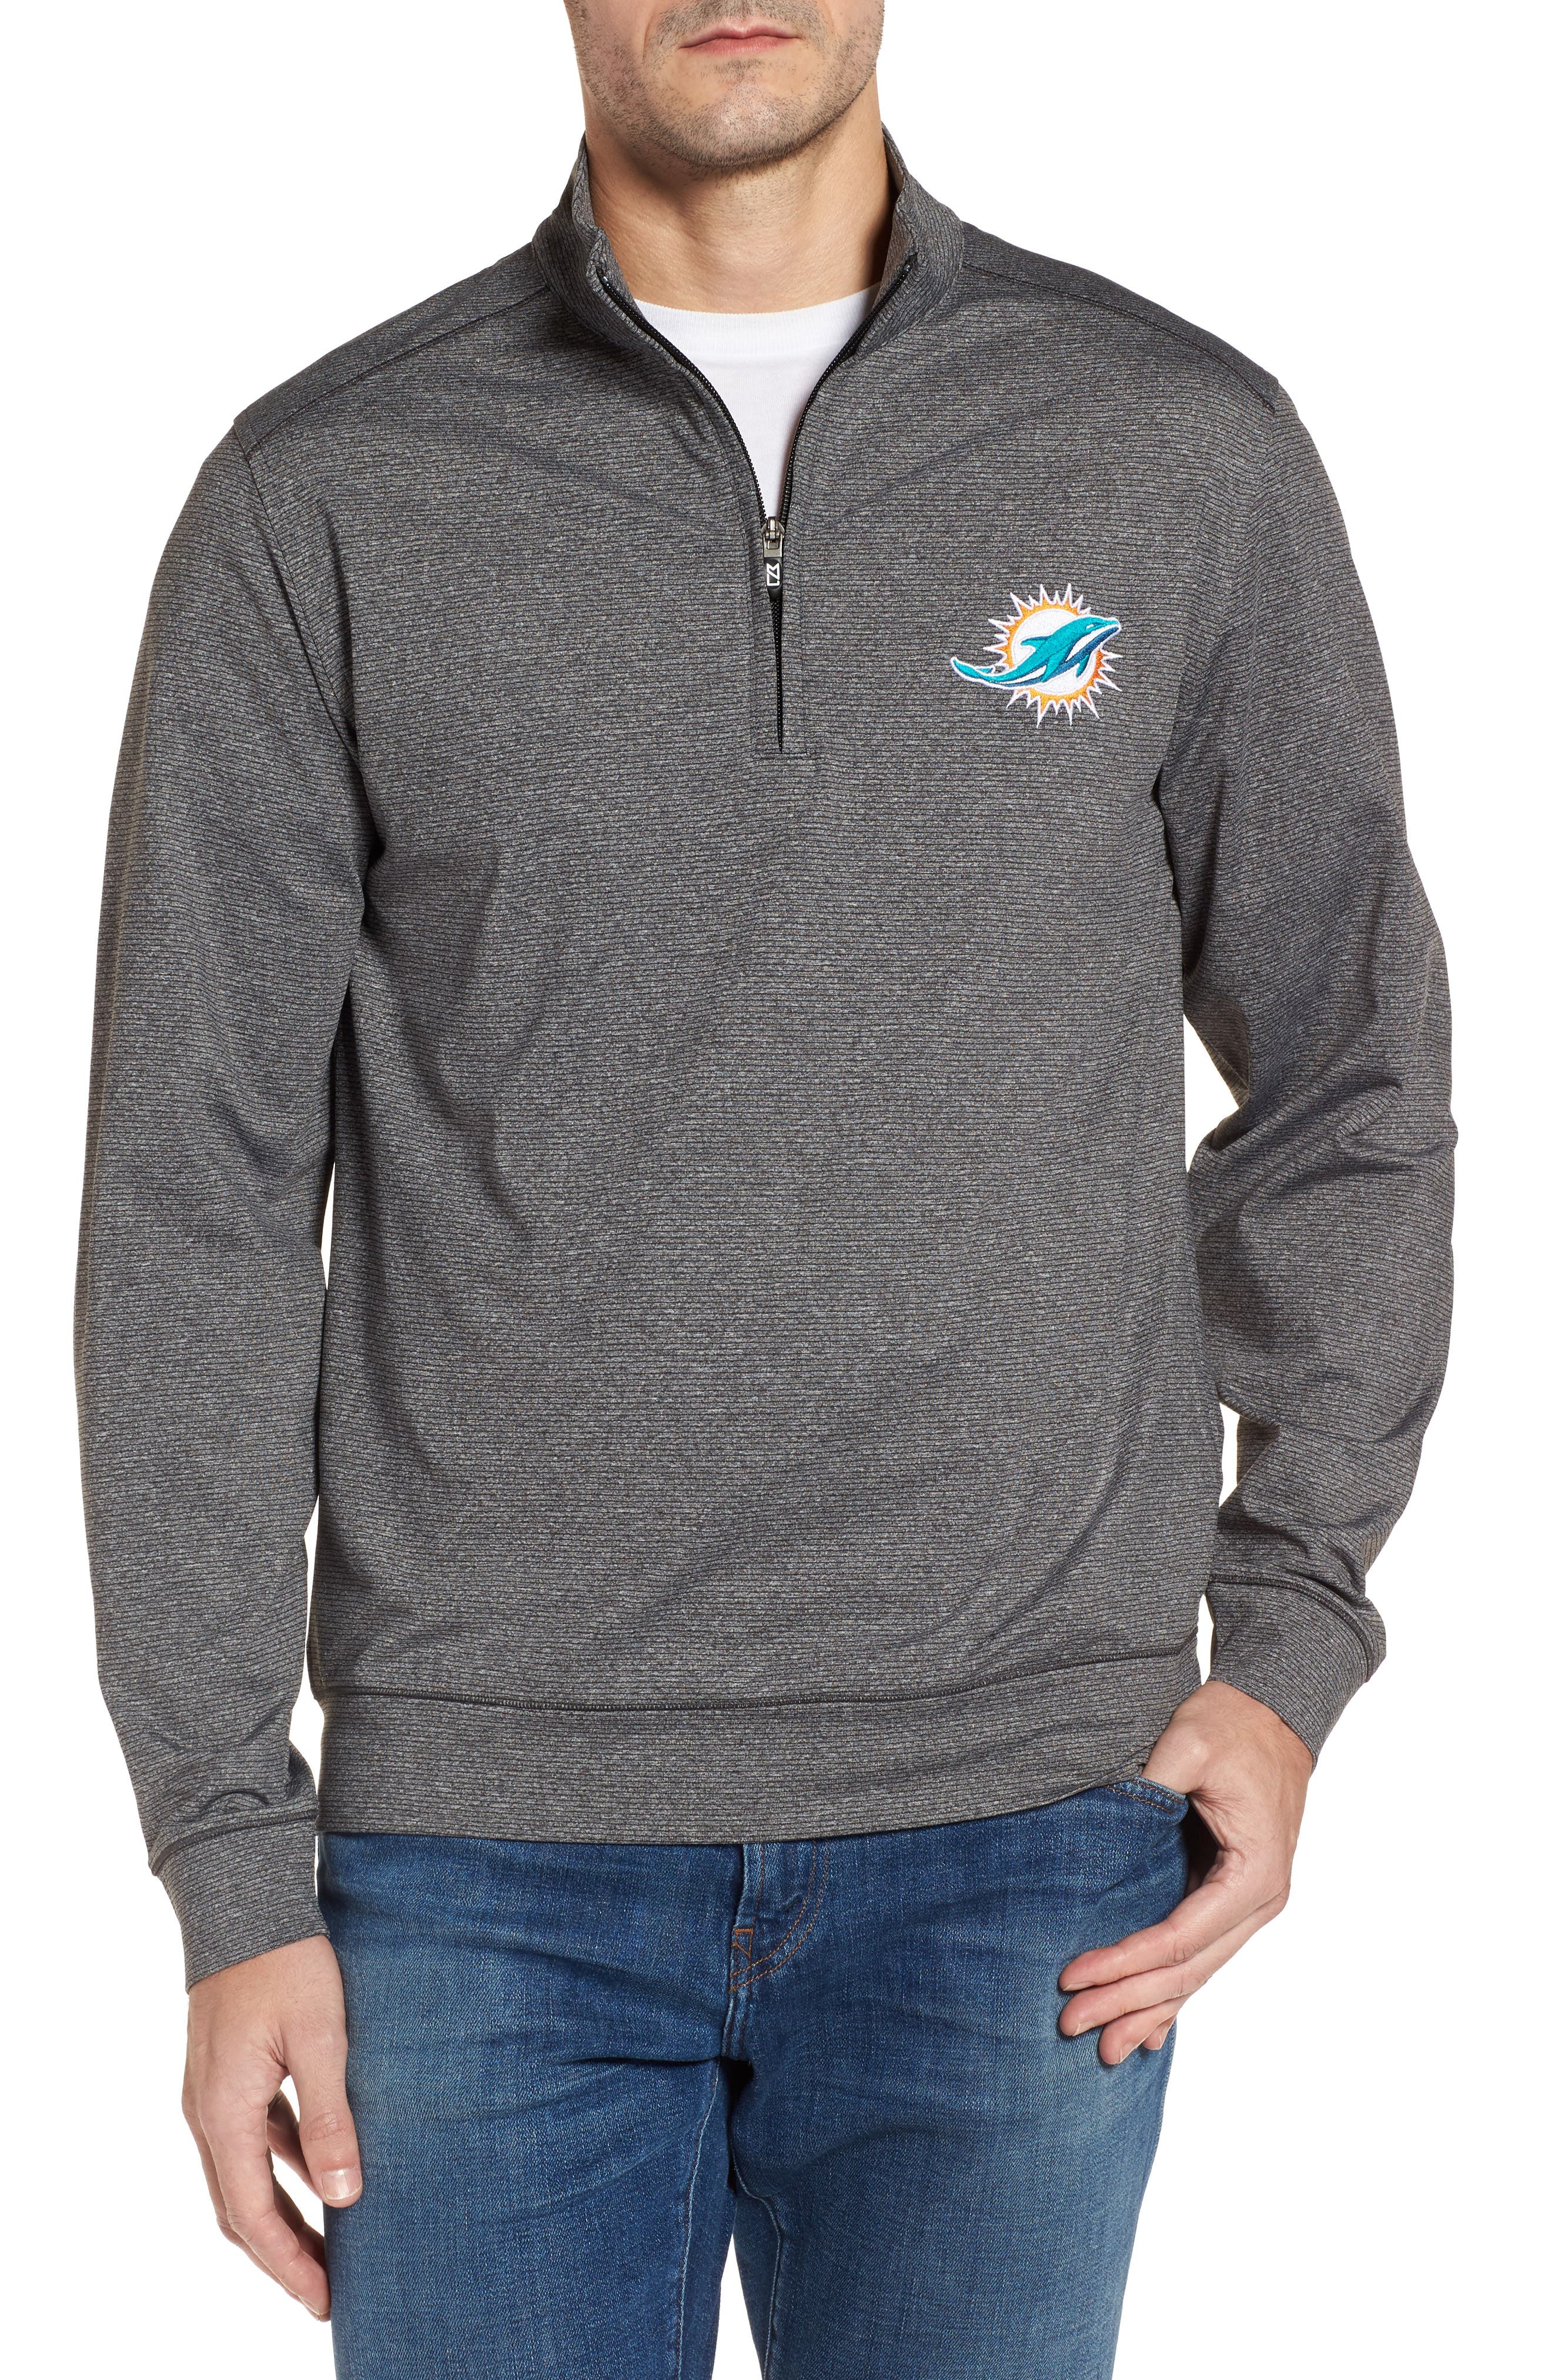 Shoreline - Miami Dolphins Half Zip Pullover,                         Main,                         color, Charcoal Heather